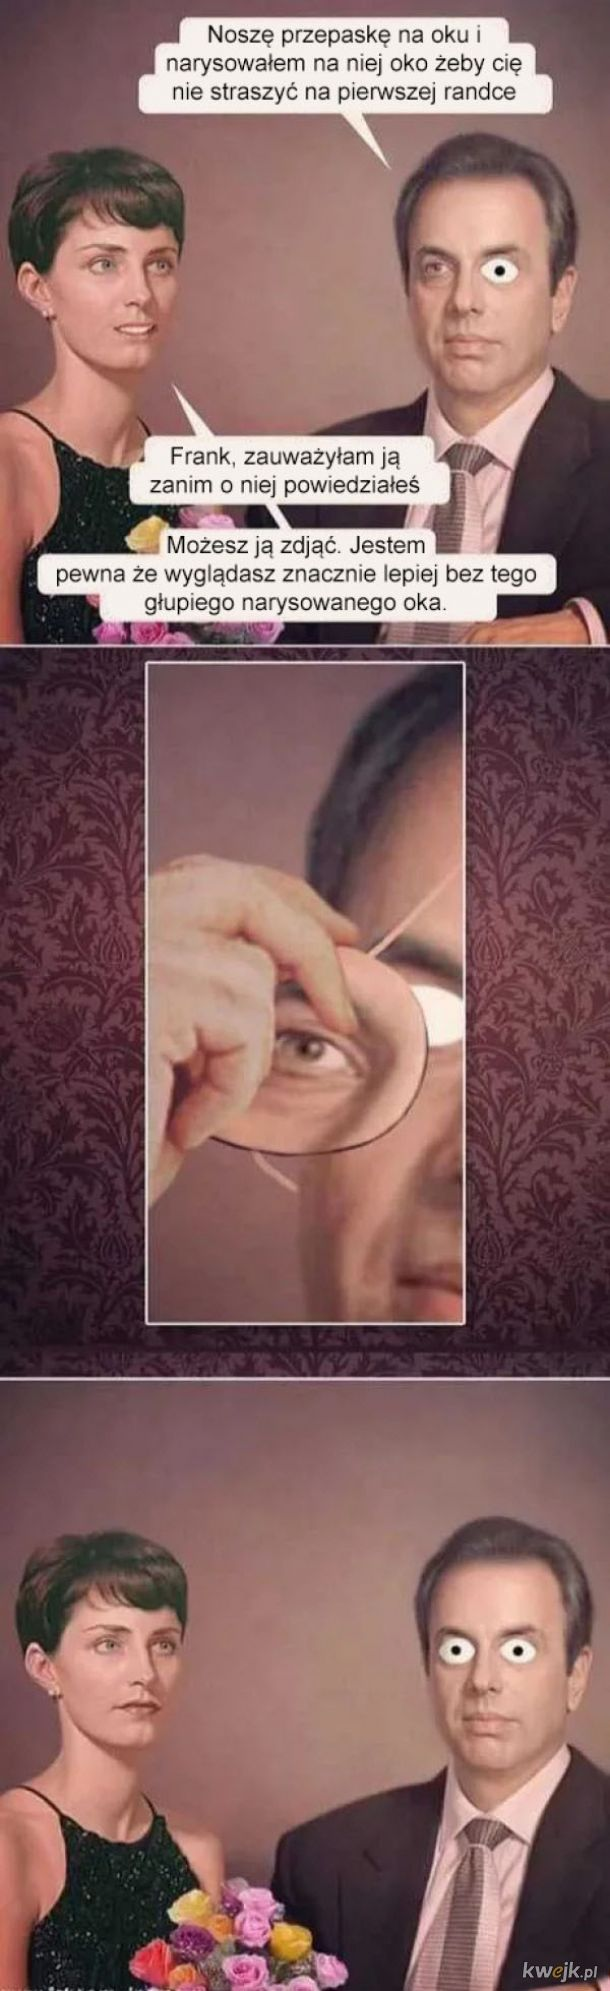 Przepaska na oku